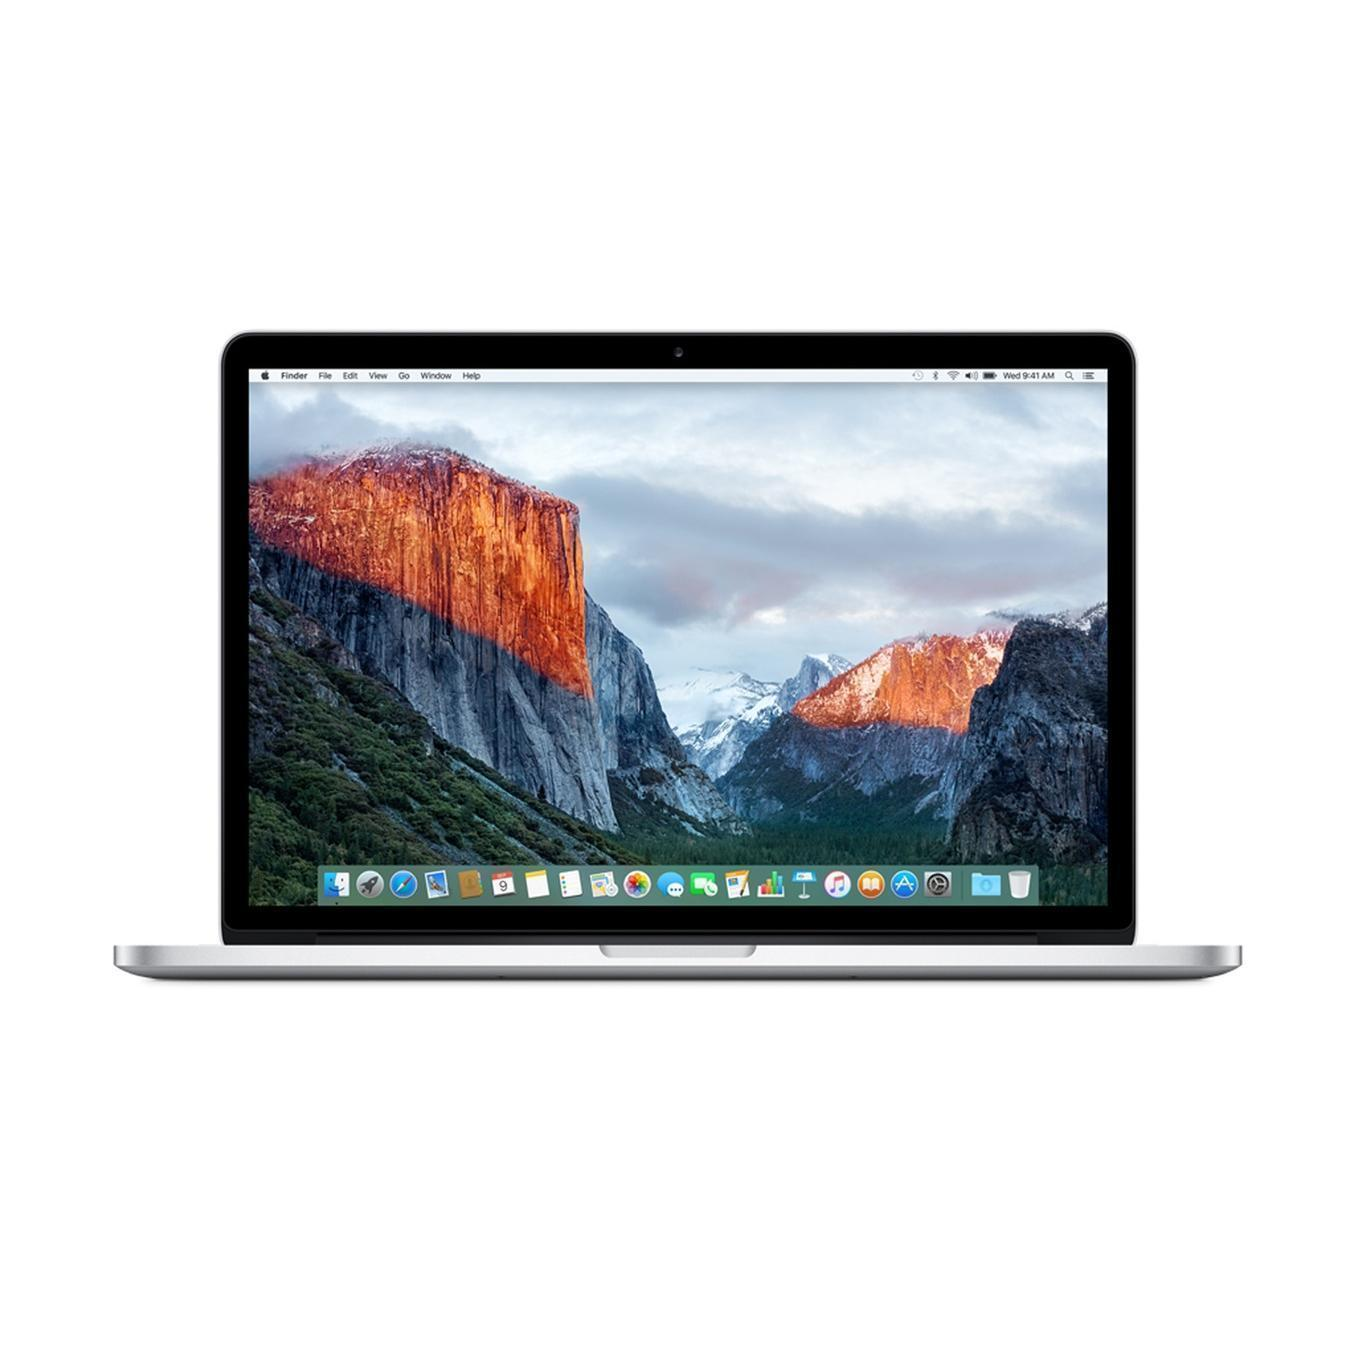 MacBook Pro Retina 15,4-tum (2014) - Core i7 - 16GB - SSD 500 GB QWERTY - Nederländska